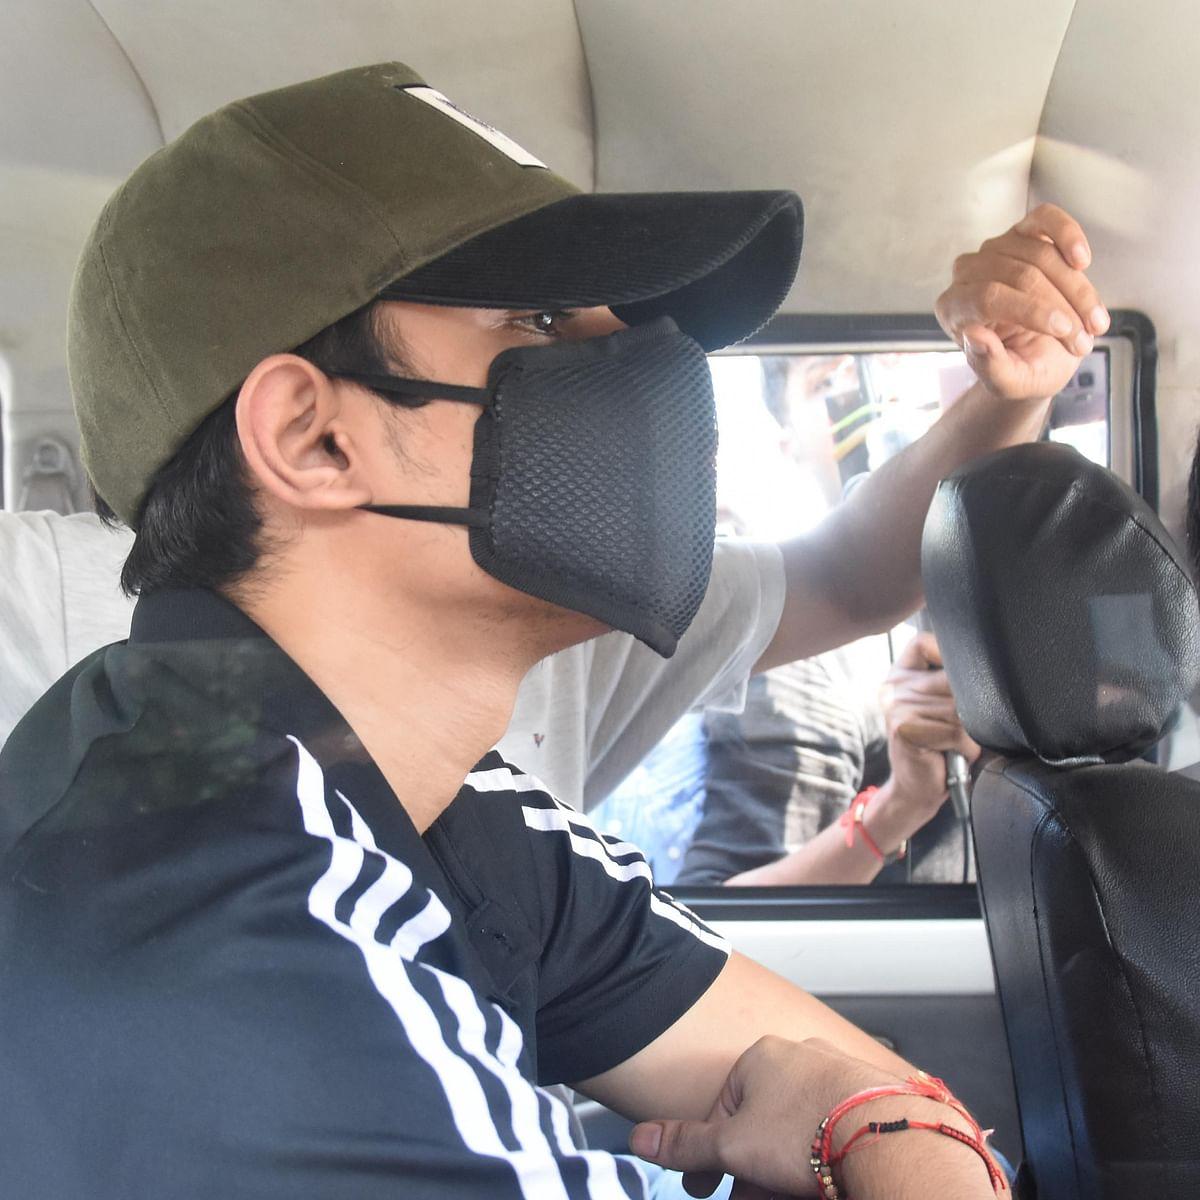 Sushant Singh Rajput death case: Showik Chakraborty, Samuel Miranda sent to NCB custody, actor's cook arrested